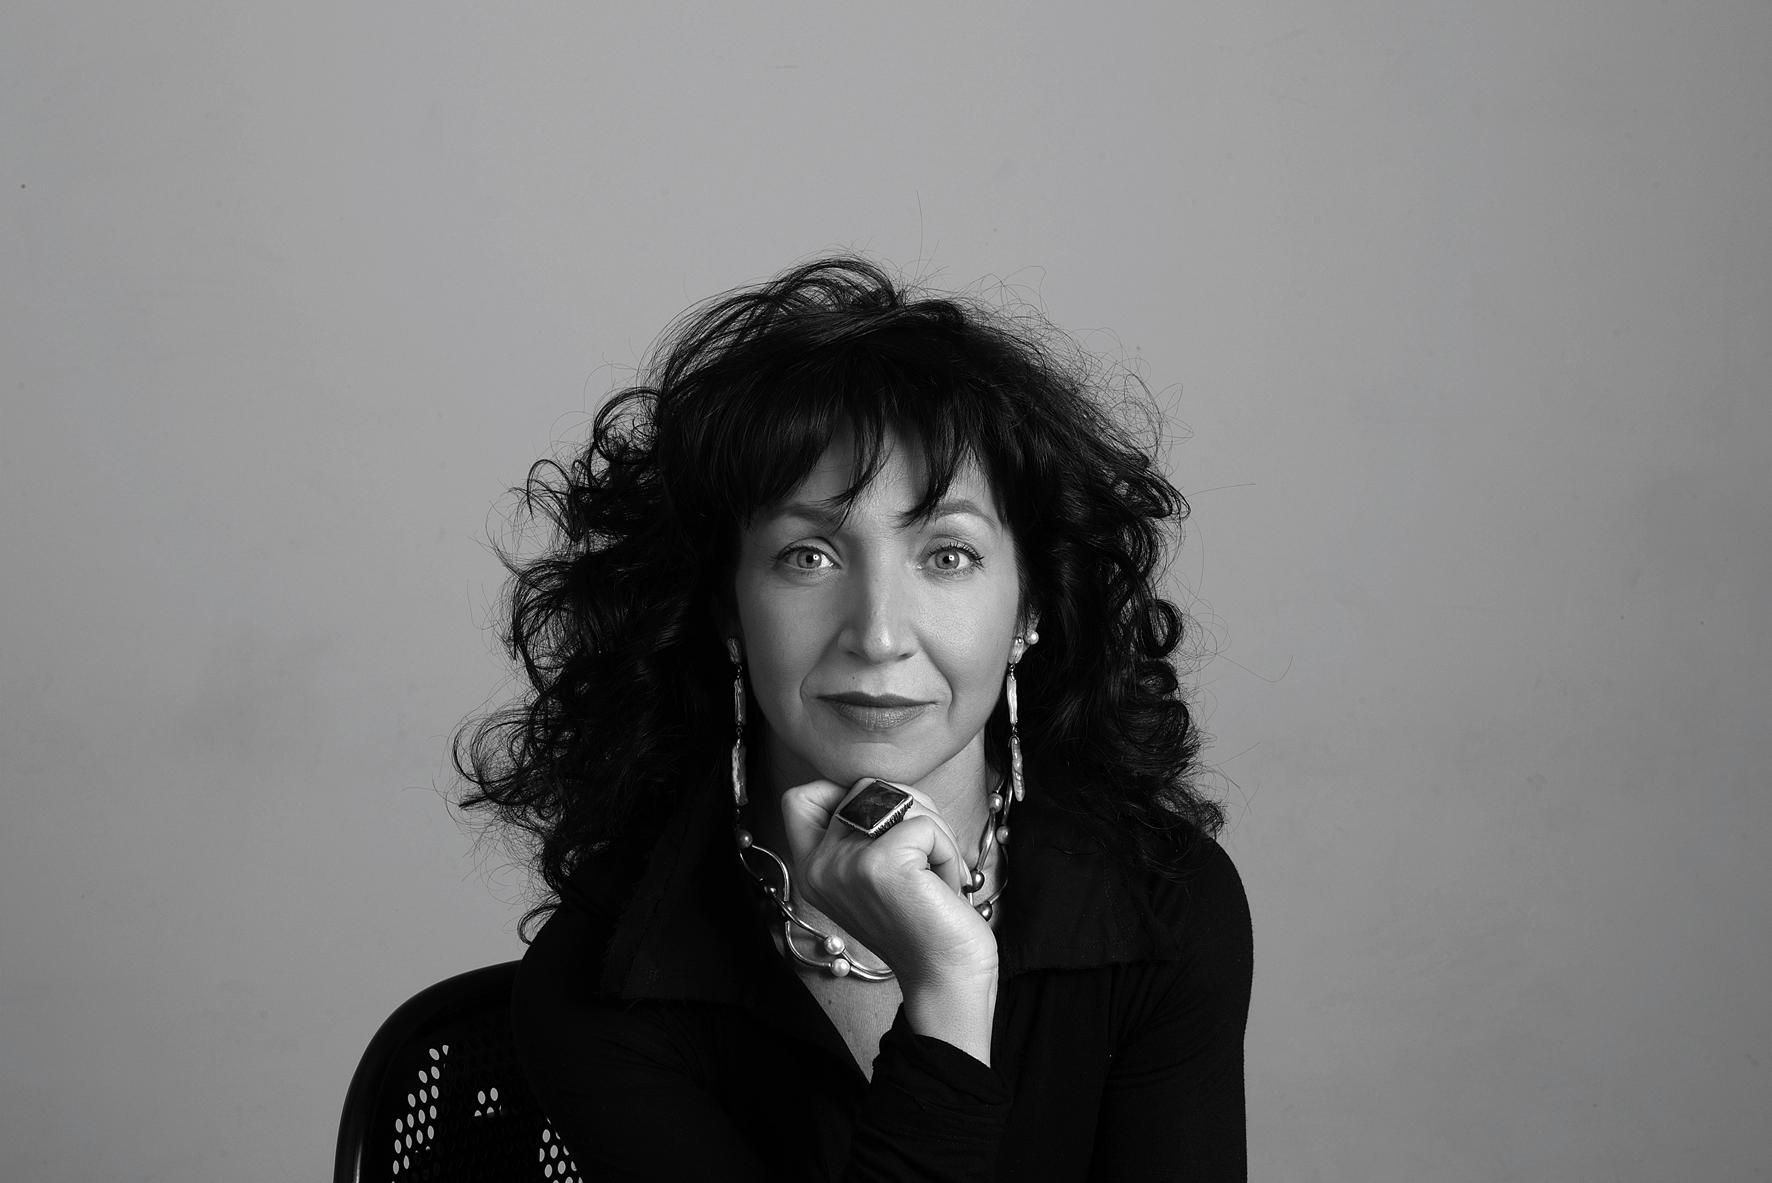 Elisabetta Polignano (003)